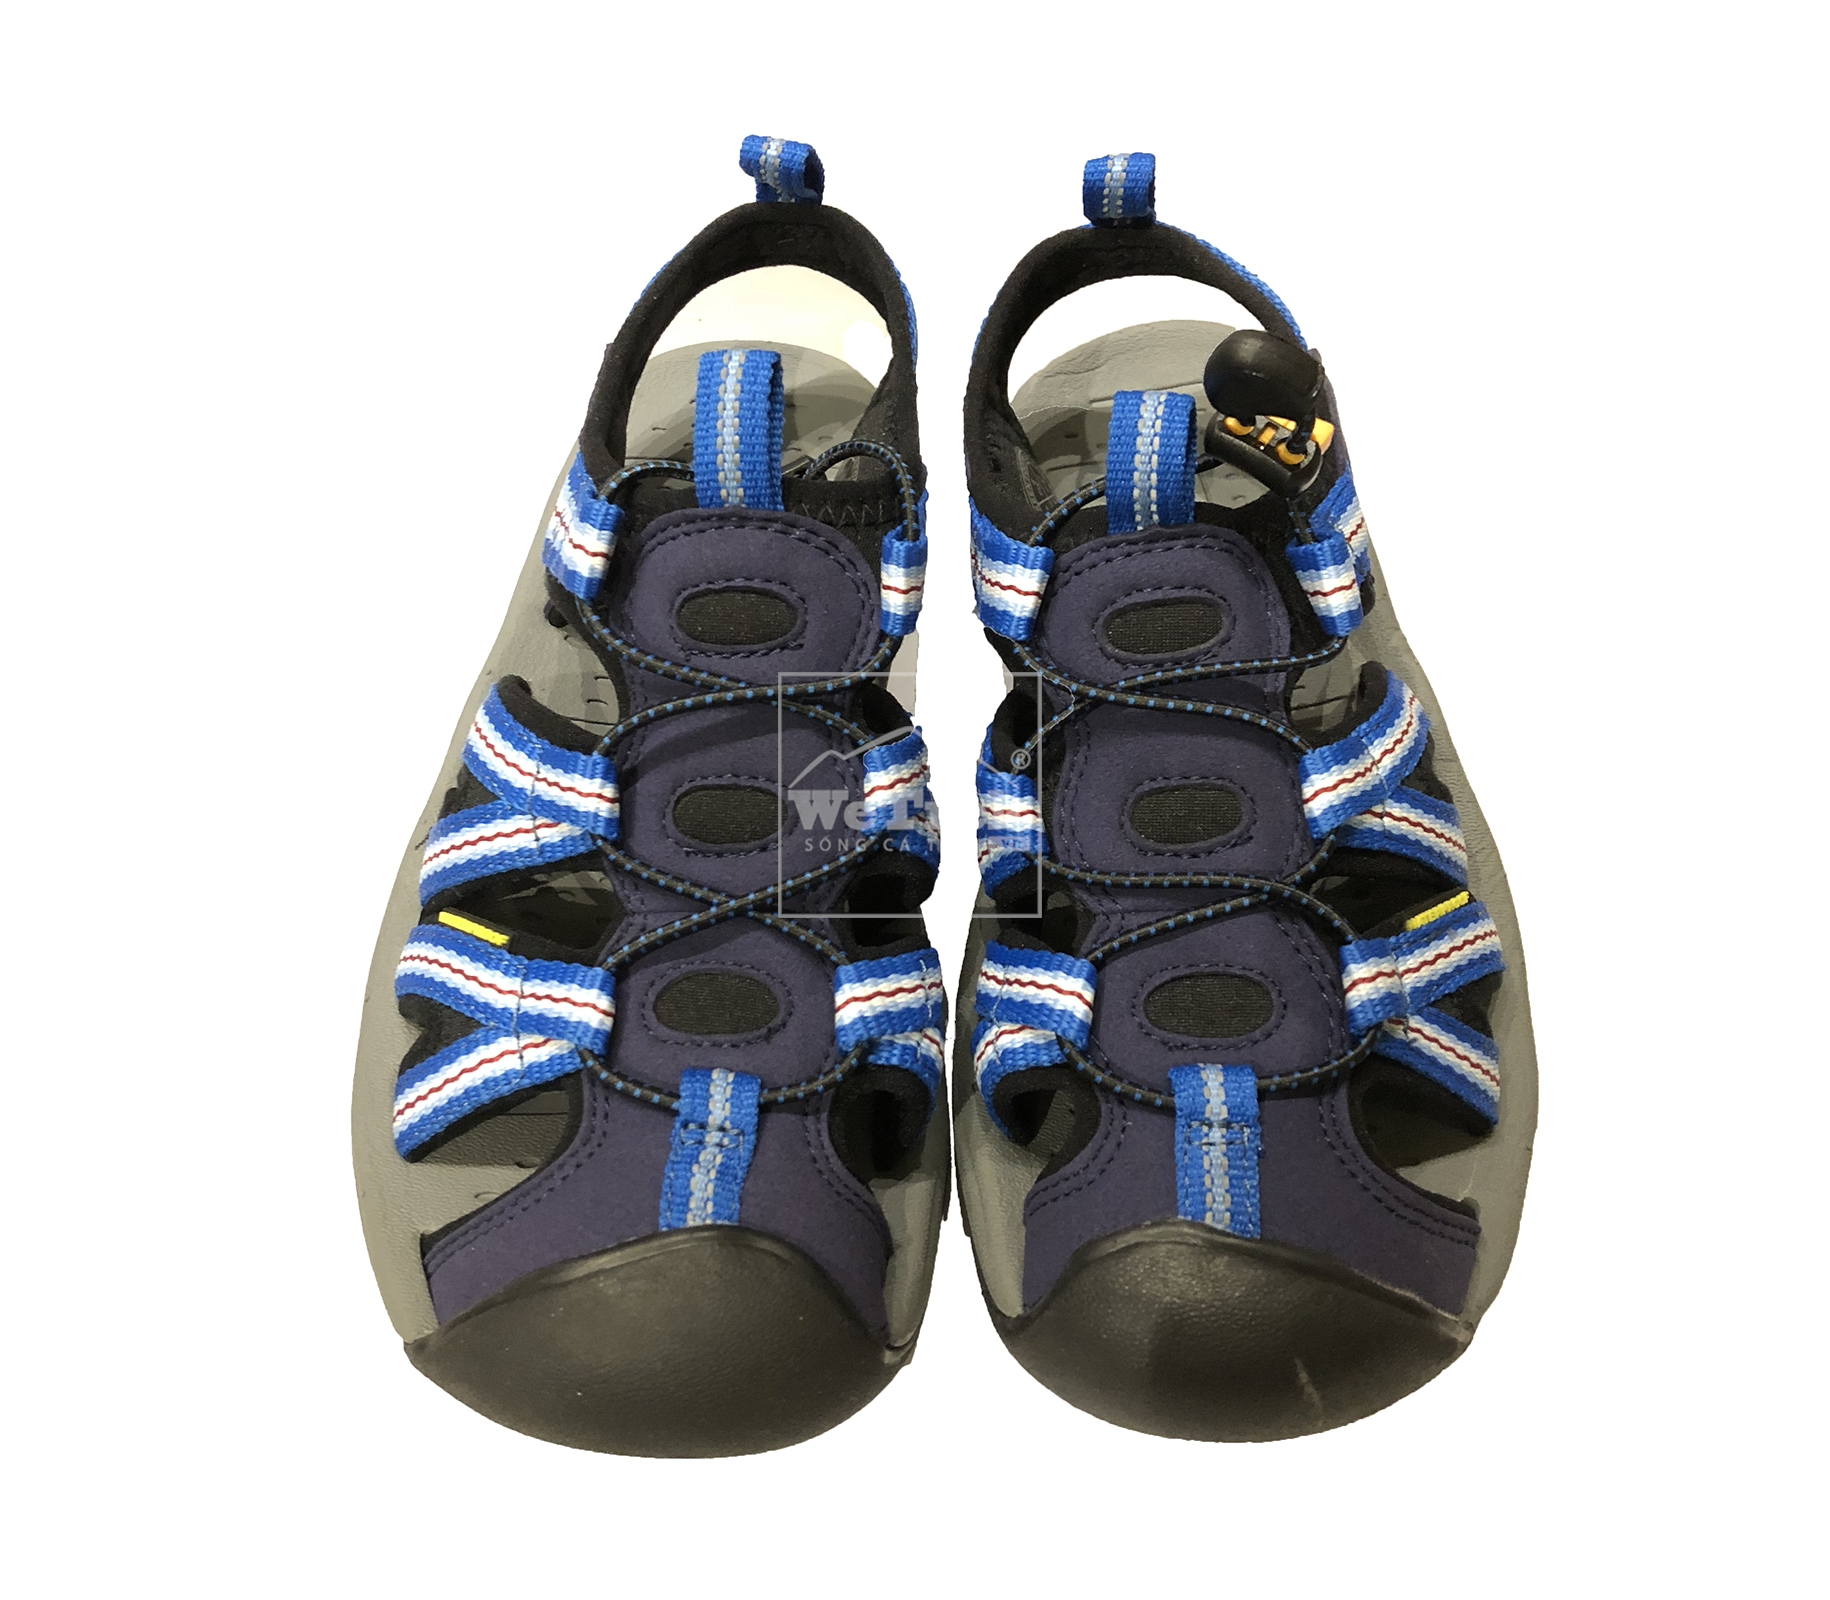 Dep-sandal-Keen-Xanh-duong-trang-8234-wetrekvn-2.jpg